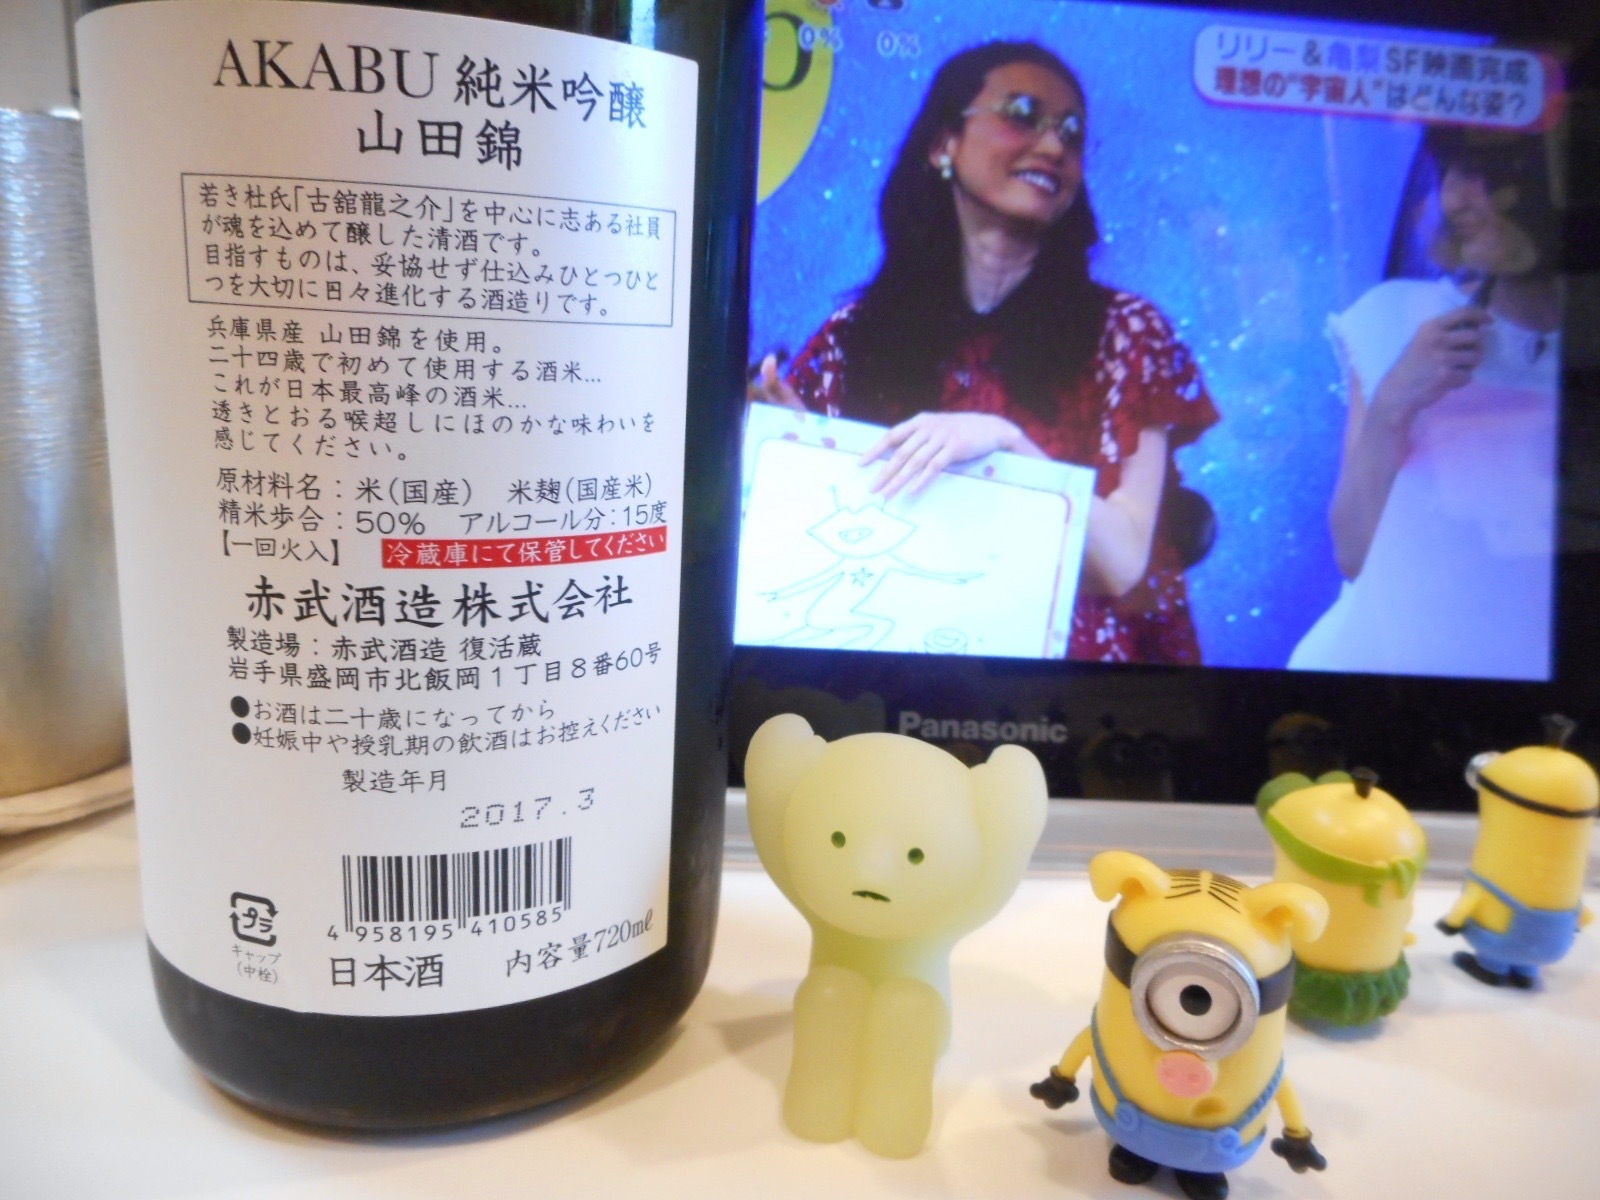 akabu_yamada5028by2.jpg